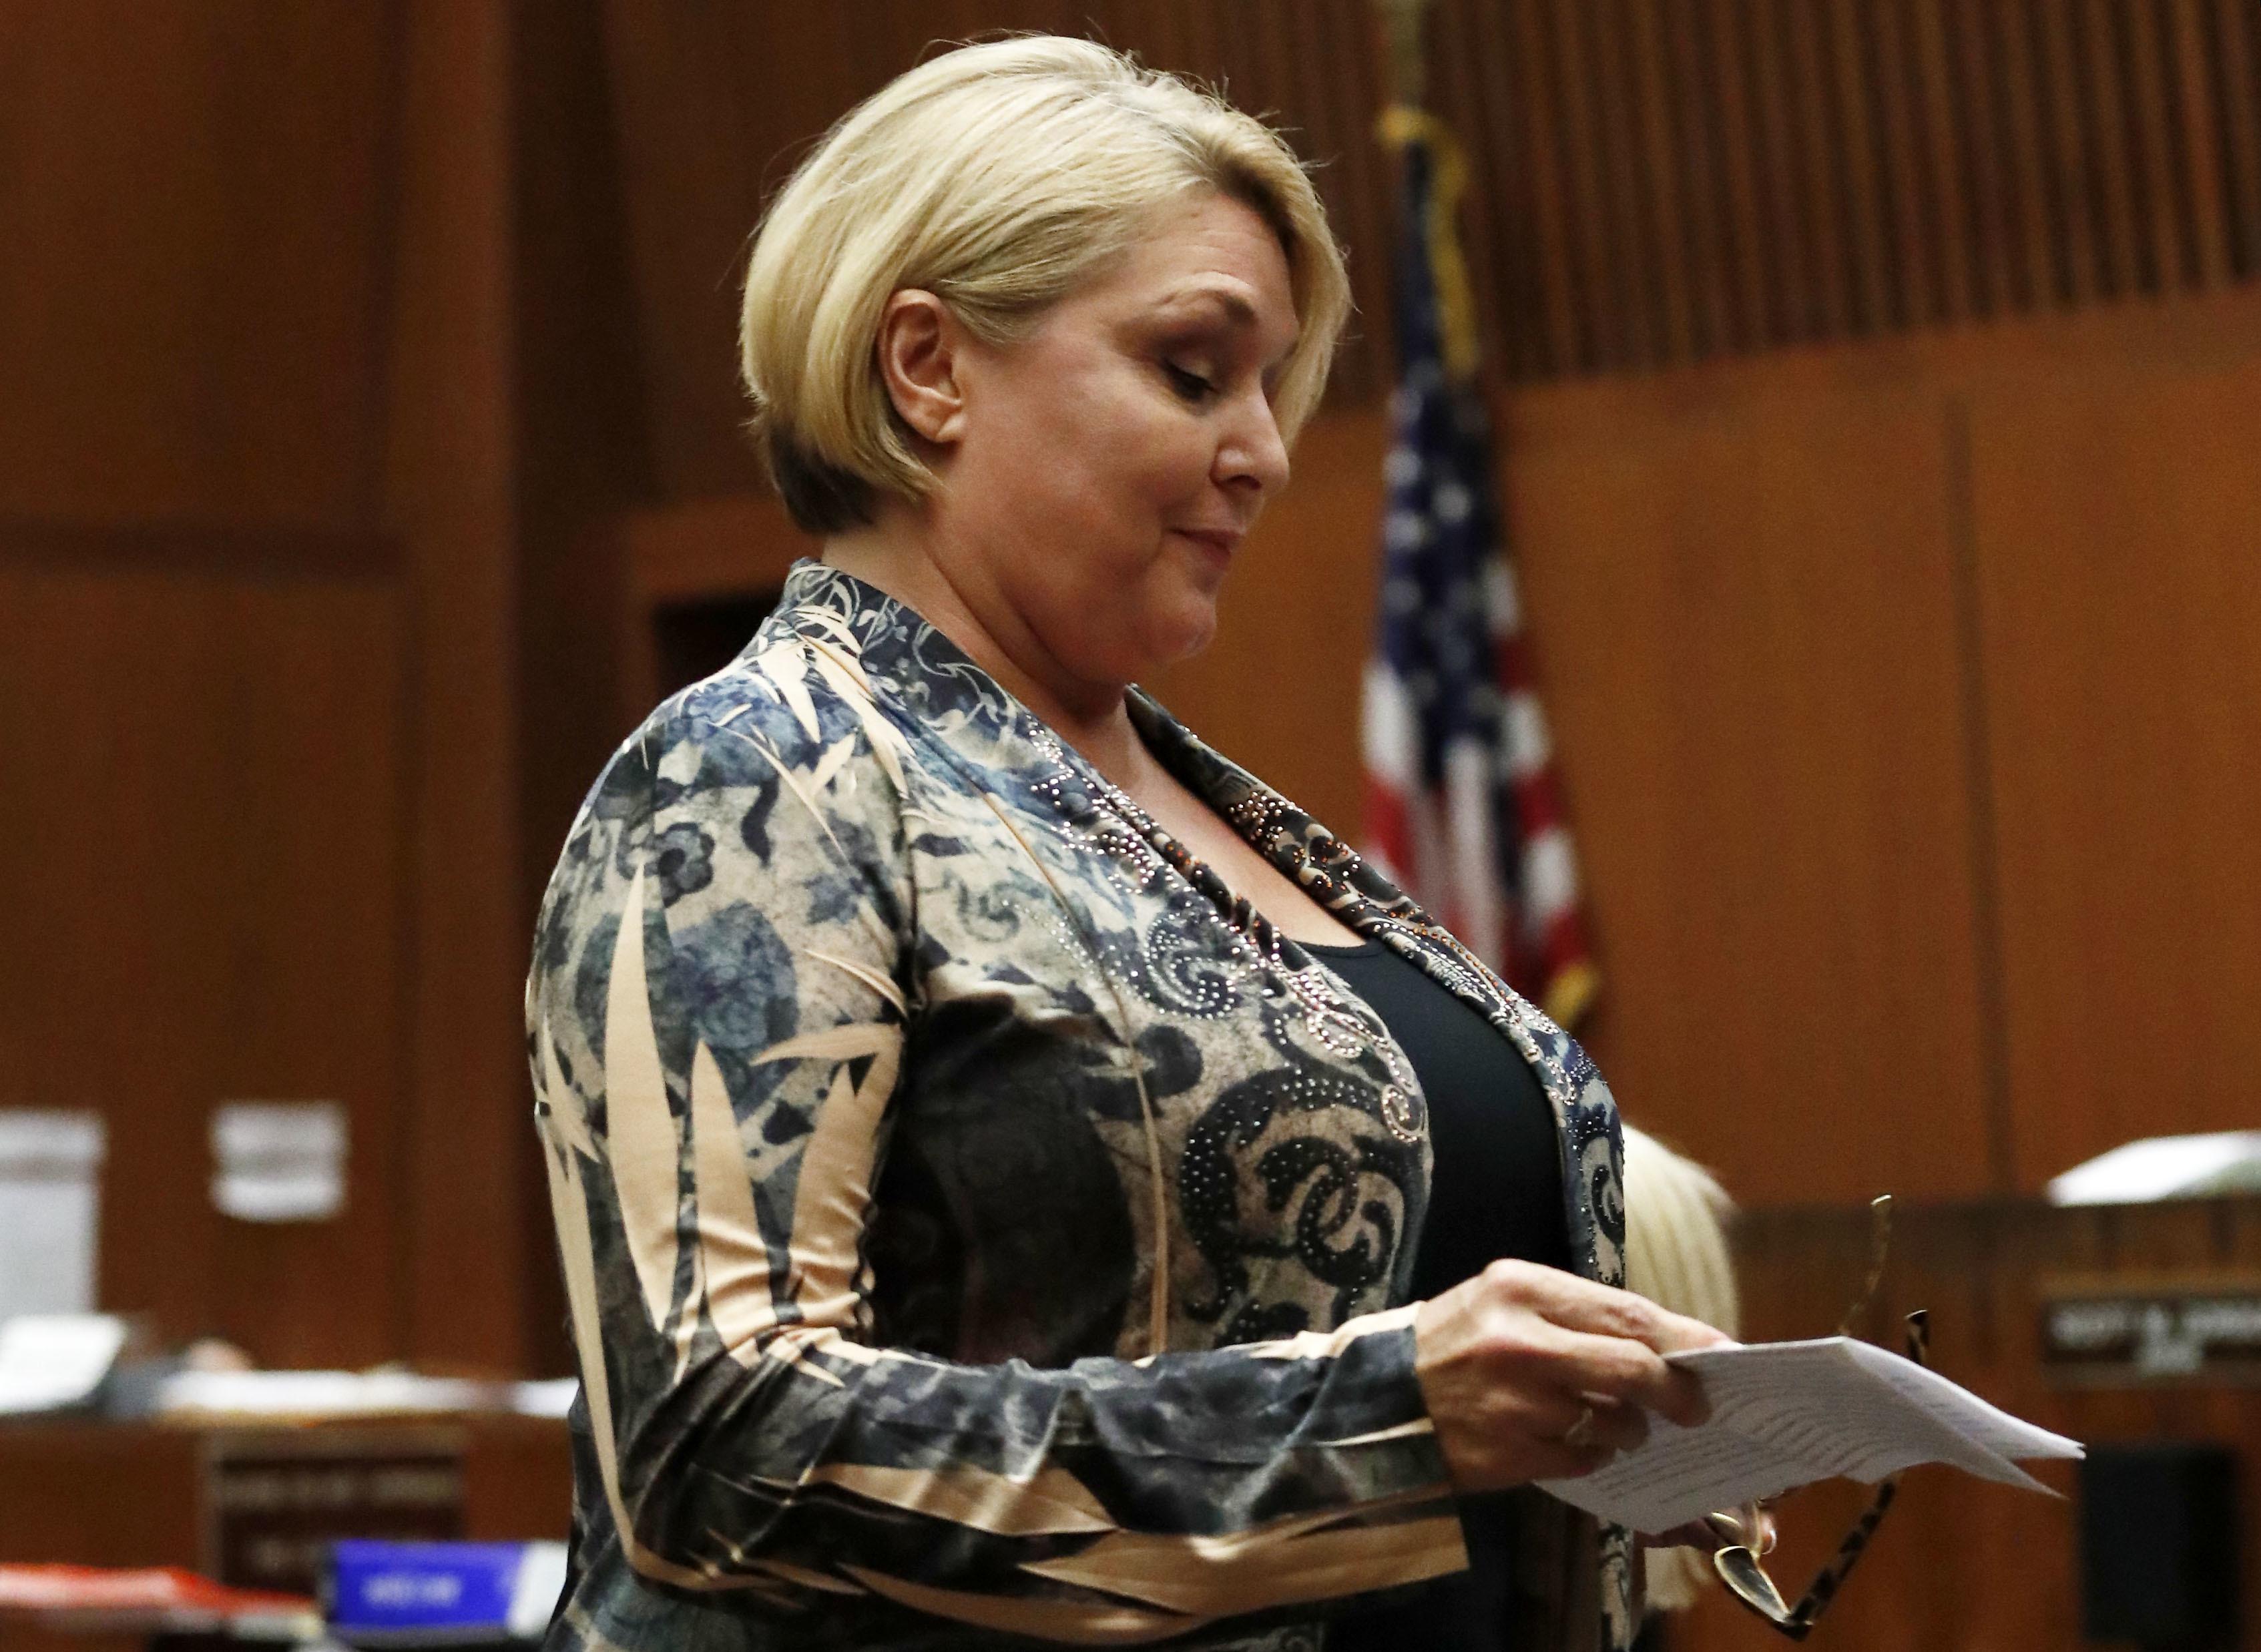 Roman Polanski's victim asks judge to dismiss sexual offence case